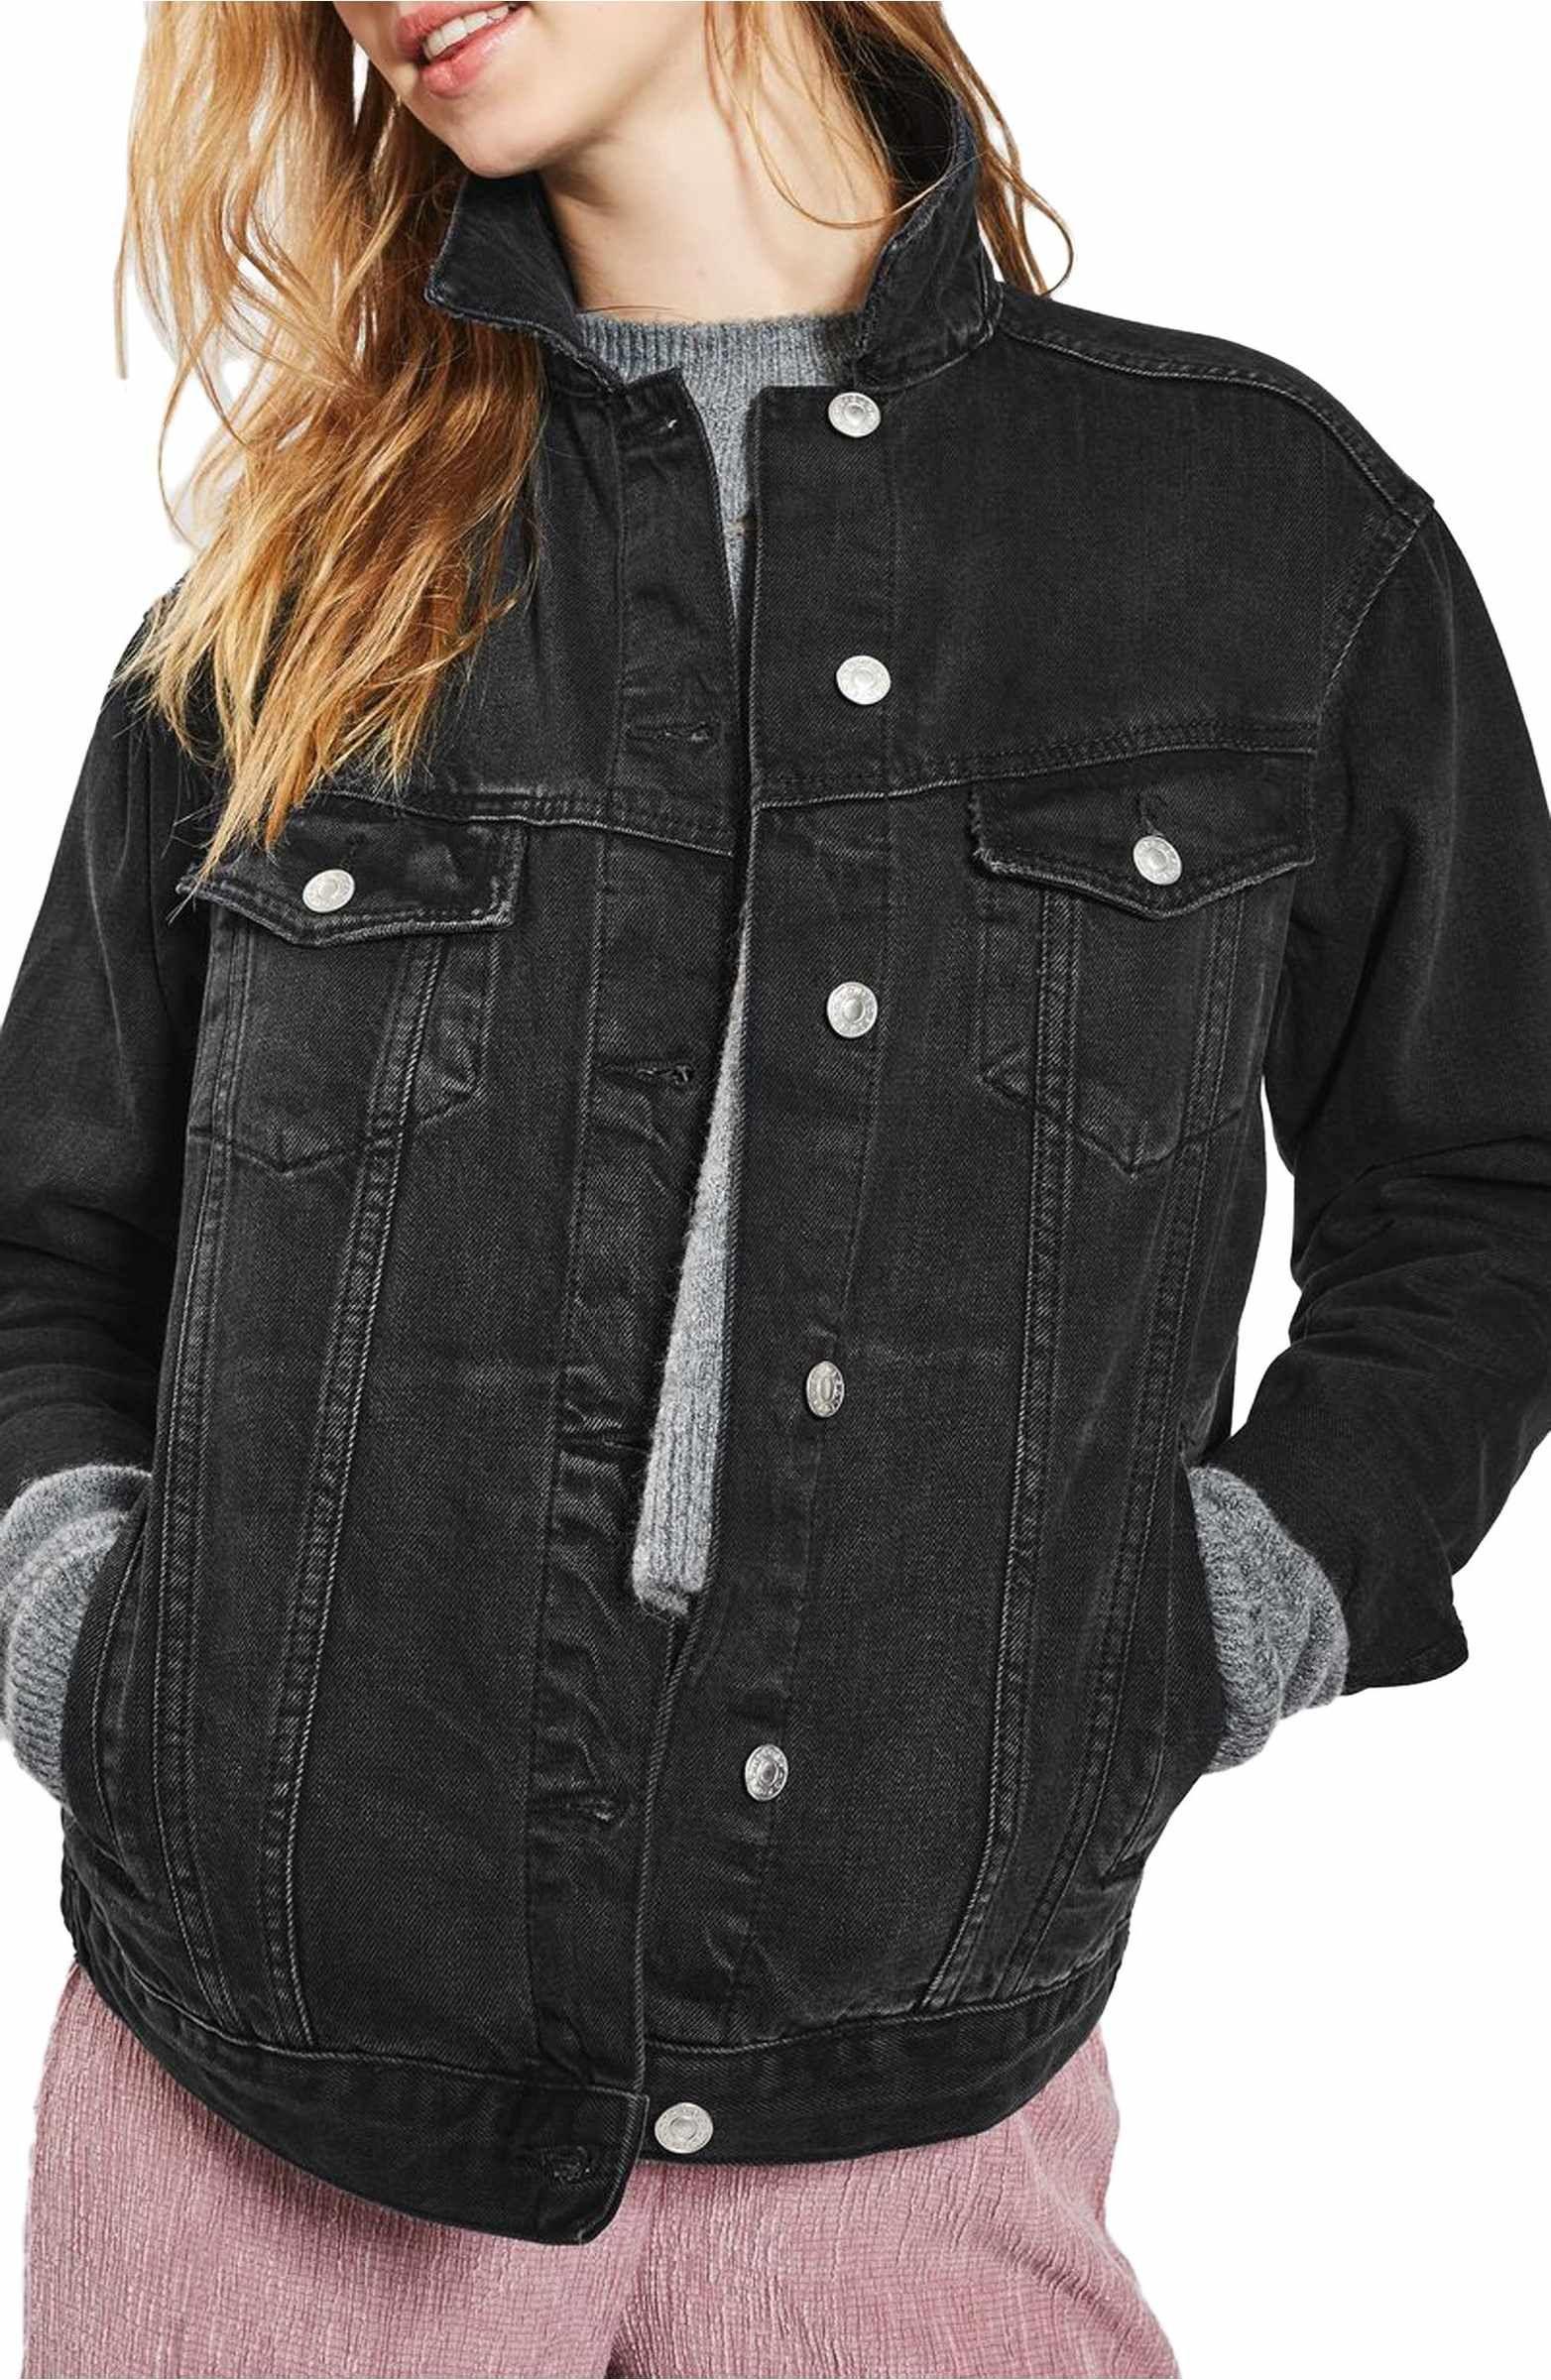 Topshop Oversize Denim Jacket Oversized Denim Jacket Oversized Black Denim Jacket Denim Fashion